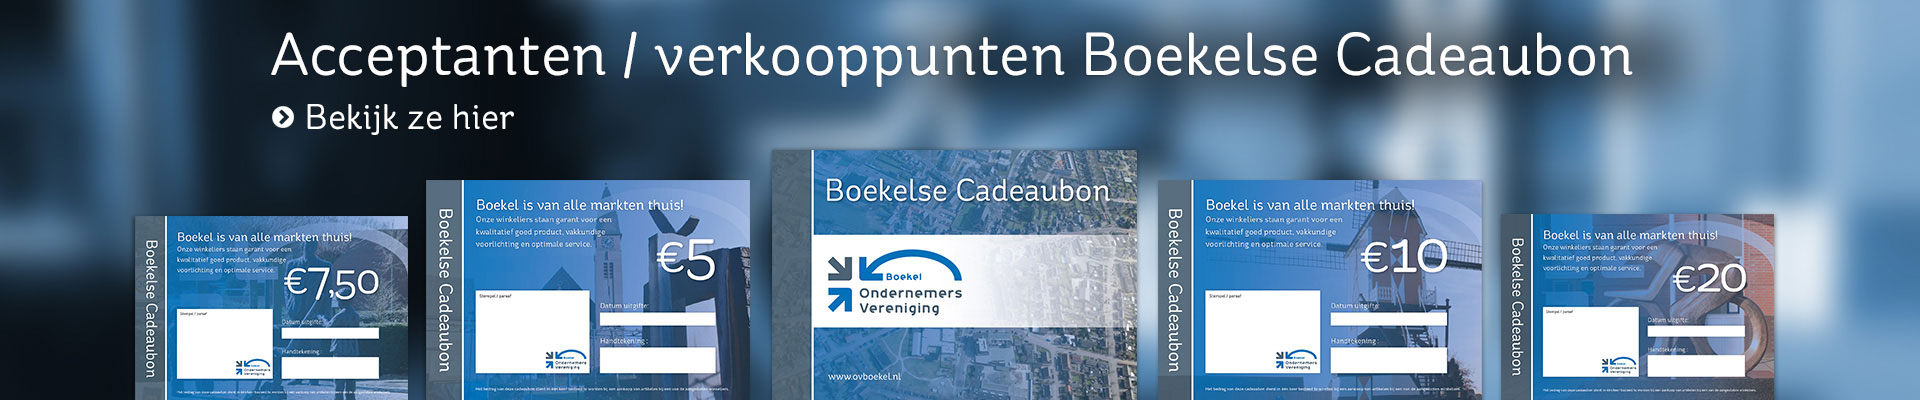 Boekelse-Cadeaubon-banner